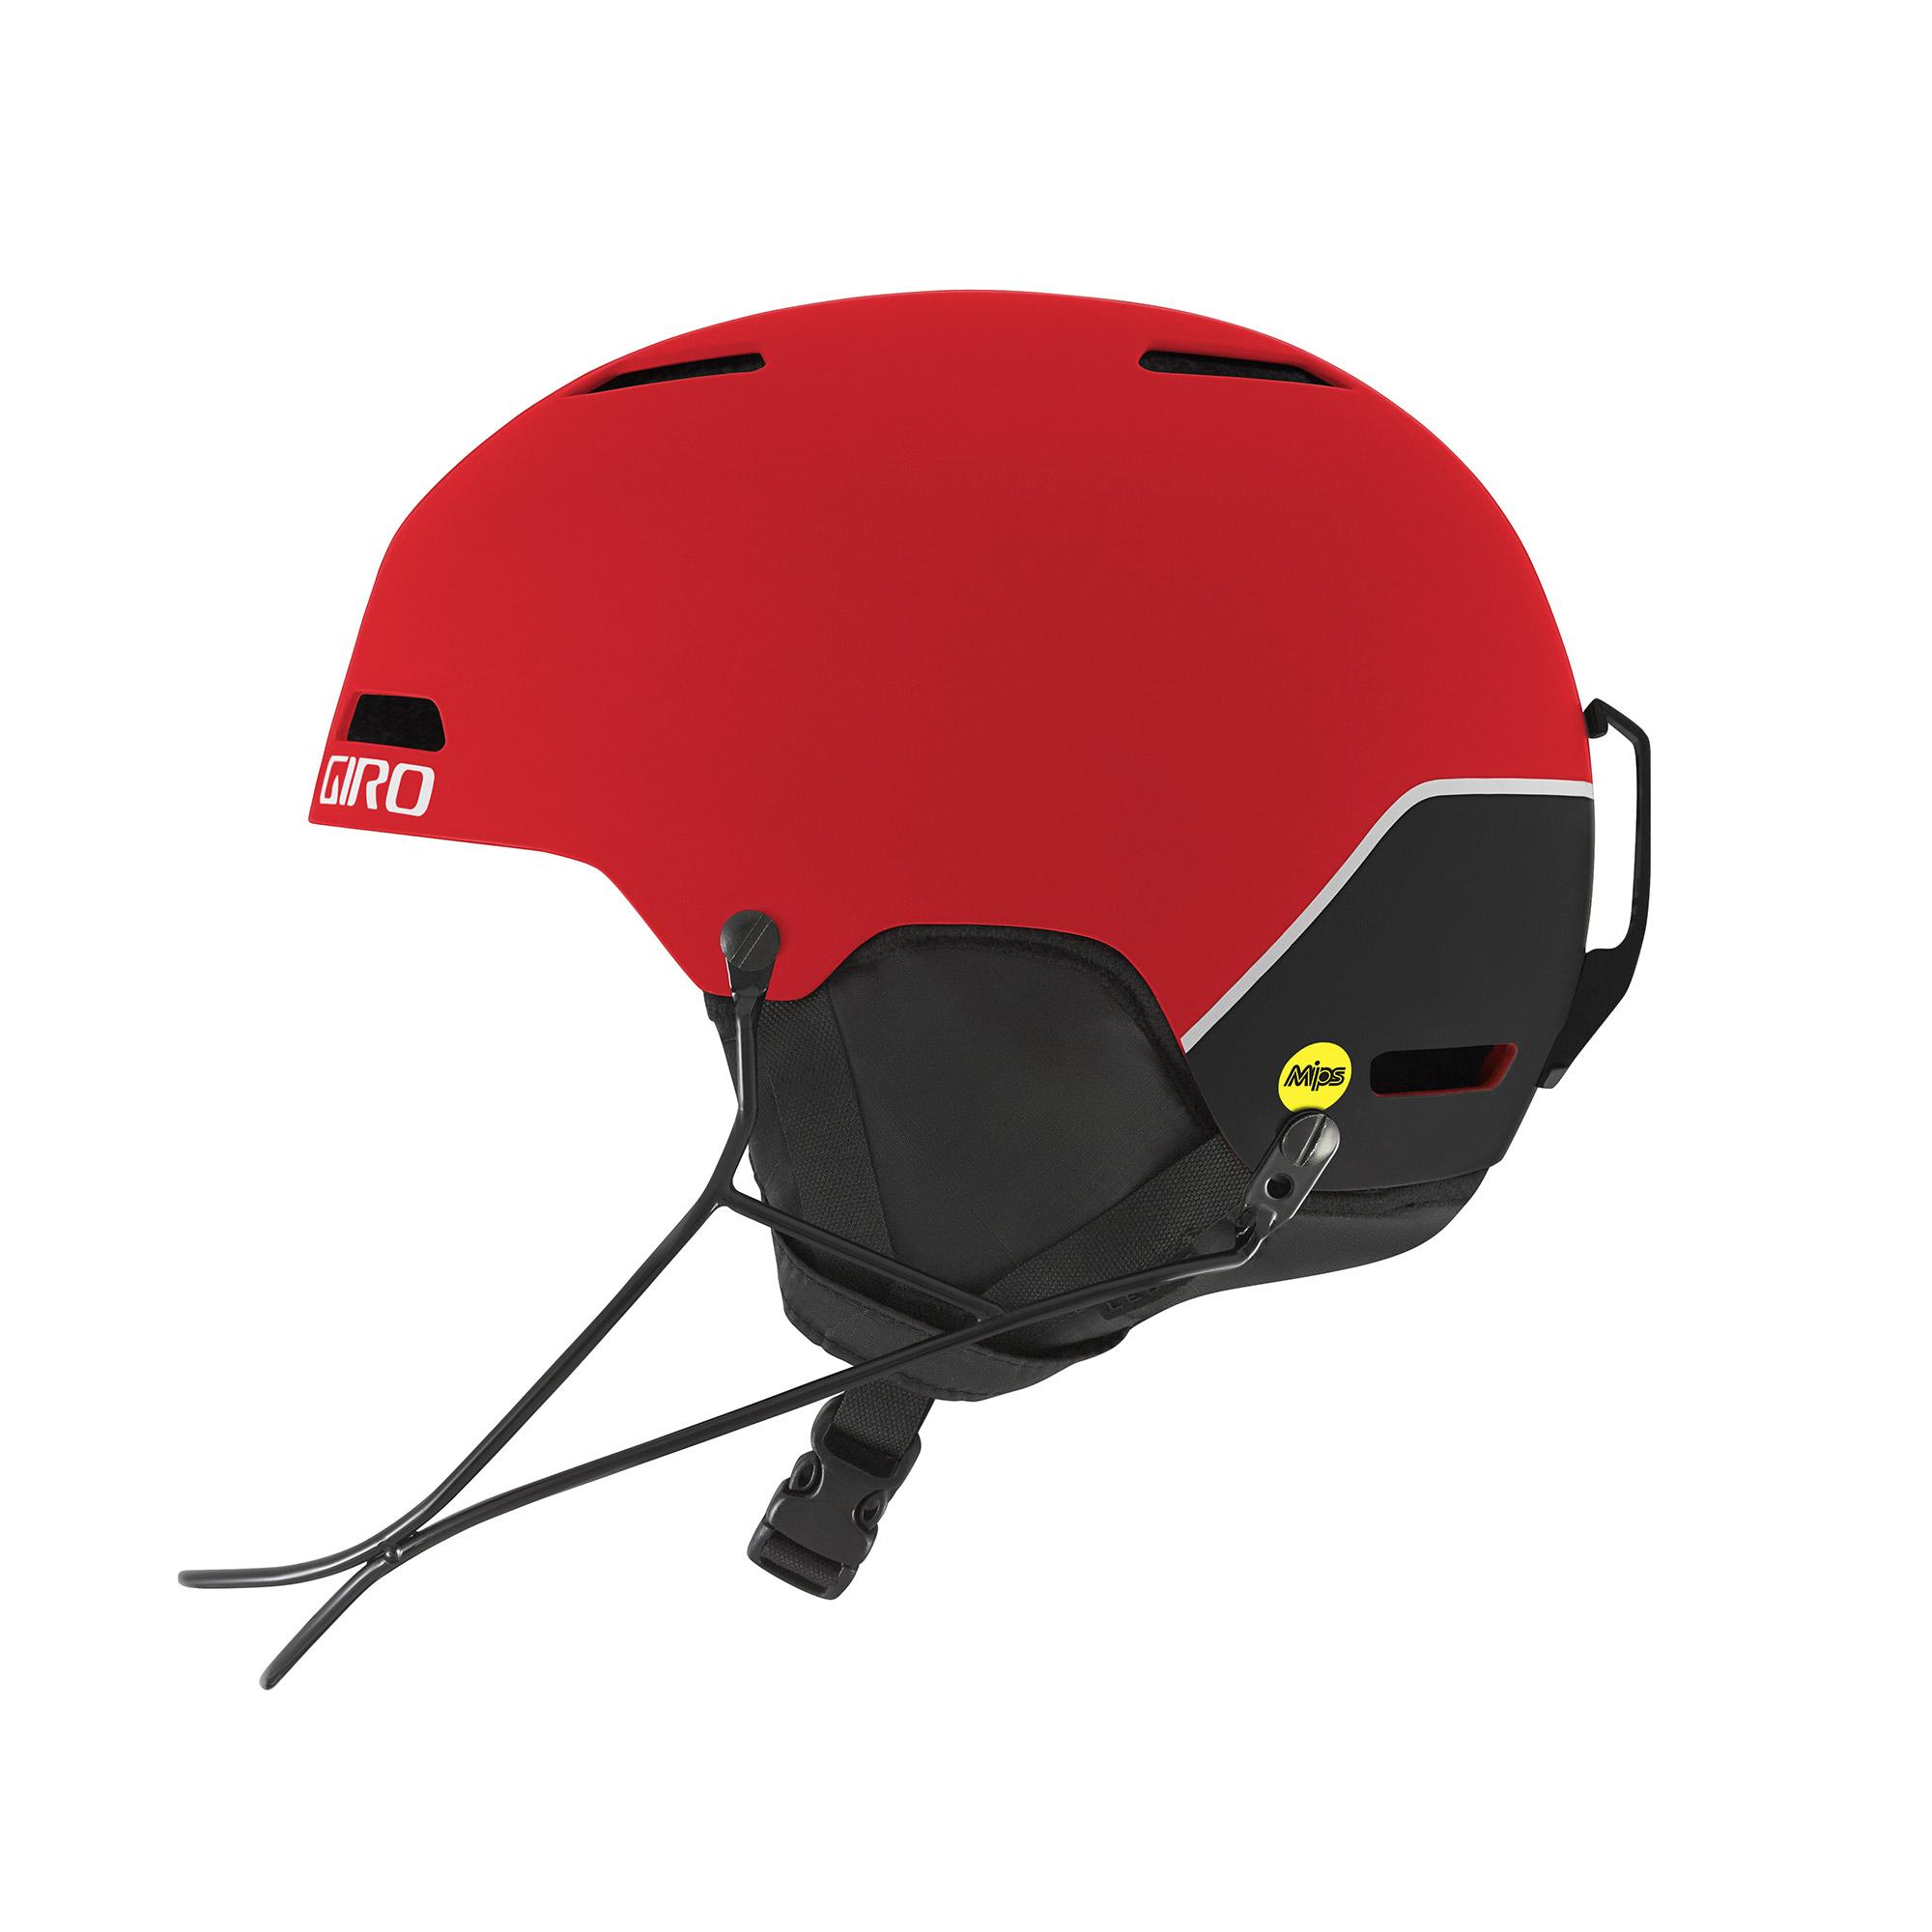 Зимний Шлем Giro 2017-18 Ledge Sl Mips Matte Red